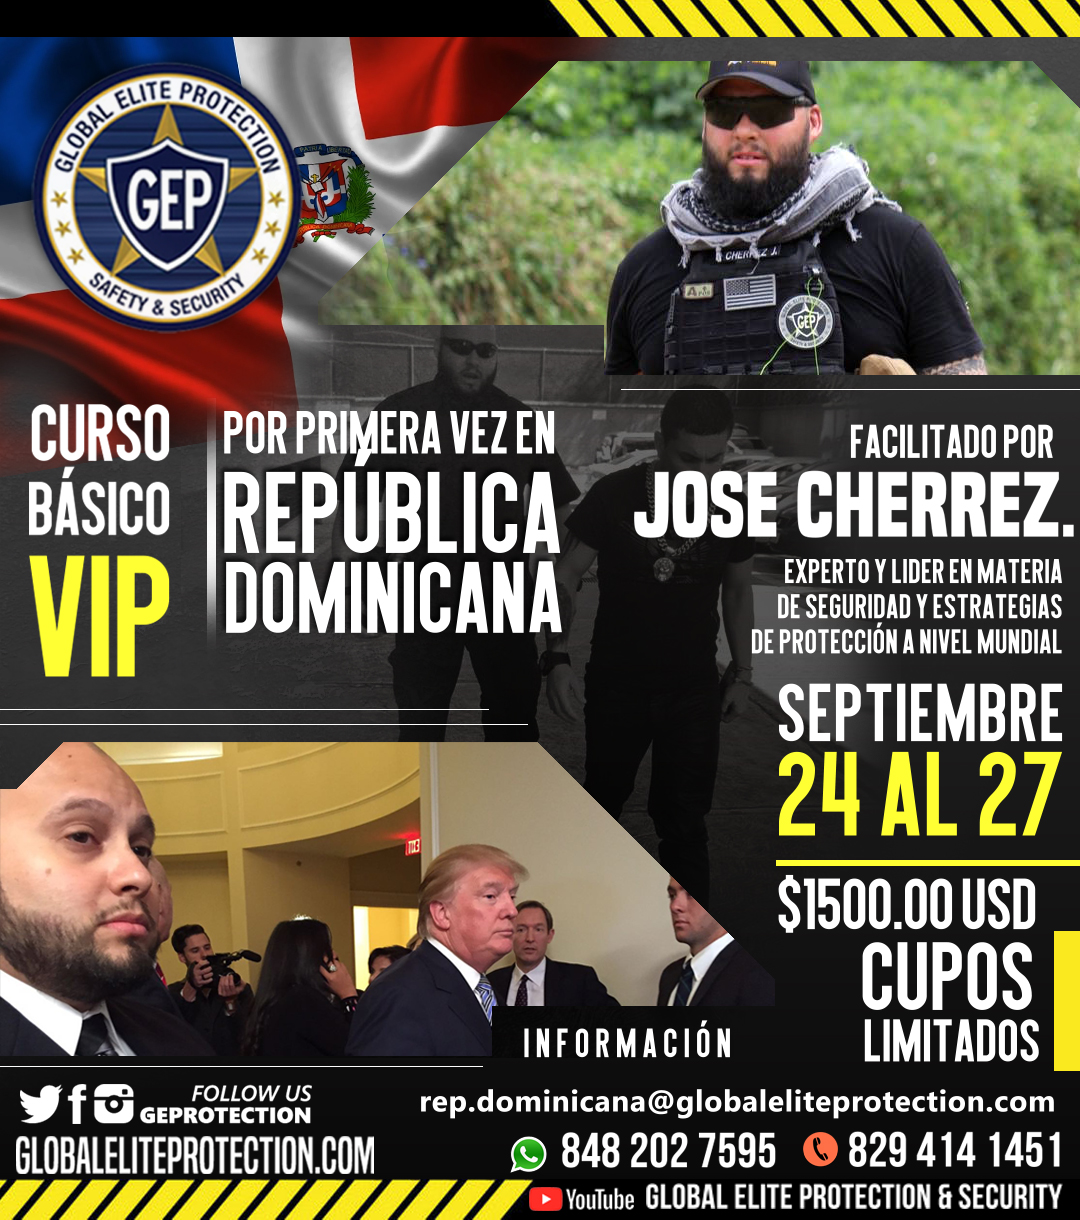 CURSO BASICO VIP